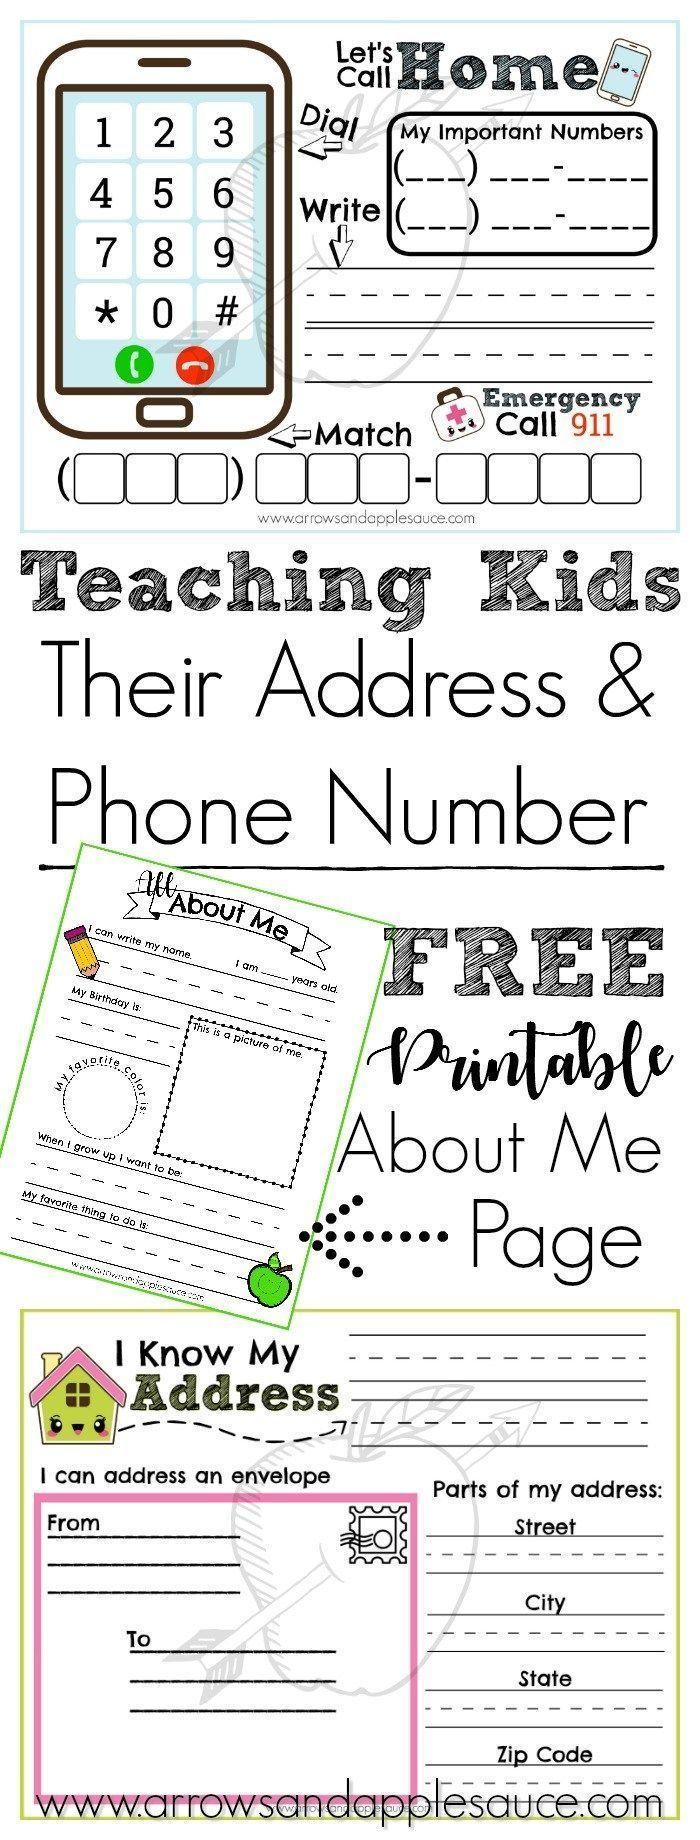 Address And Phone Number Activities Free About Me Printable Arrows Applesauce Preschool Learning Activities Educational Printables Homeschool Kindergarten [ 1840 x 700 Pixel ]